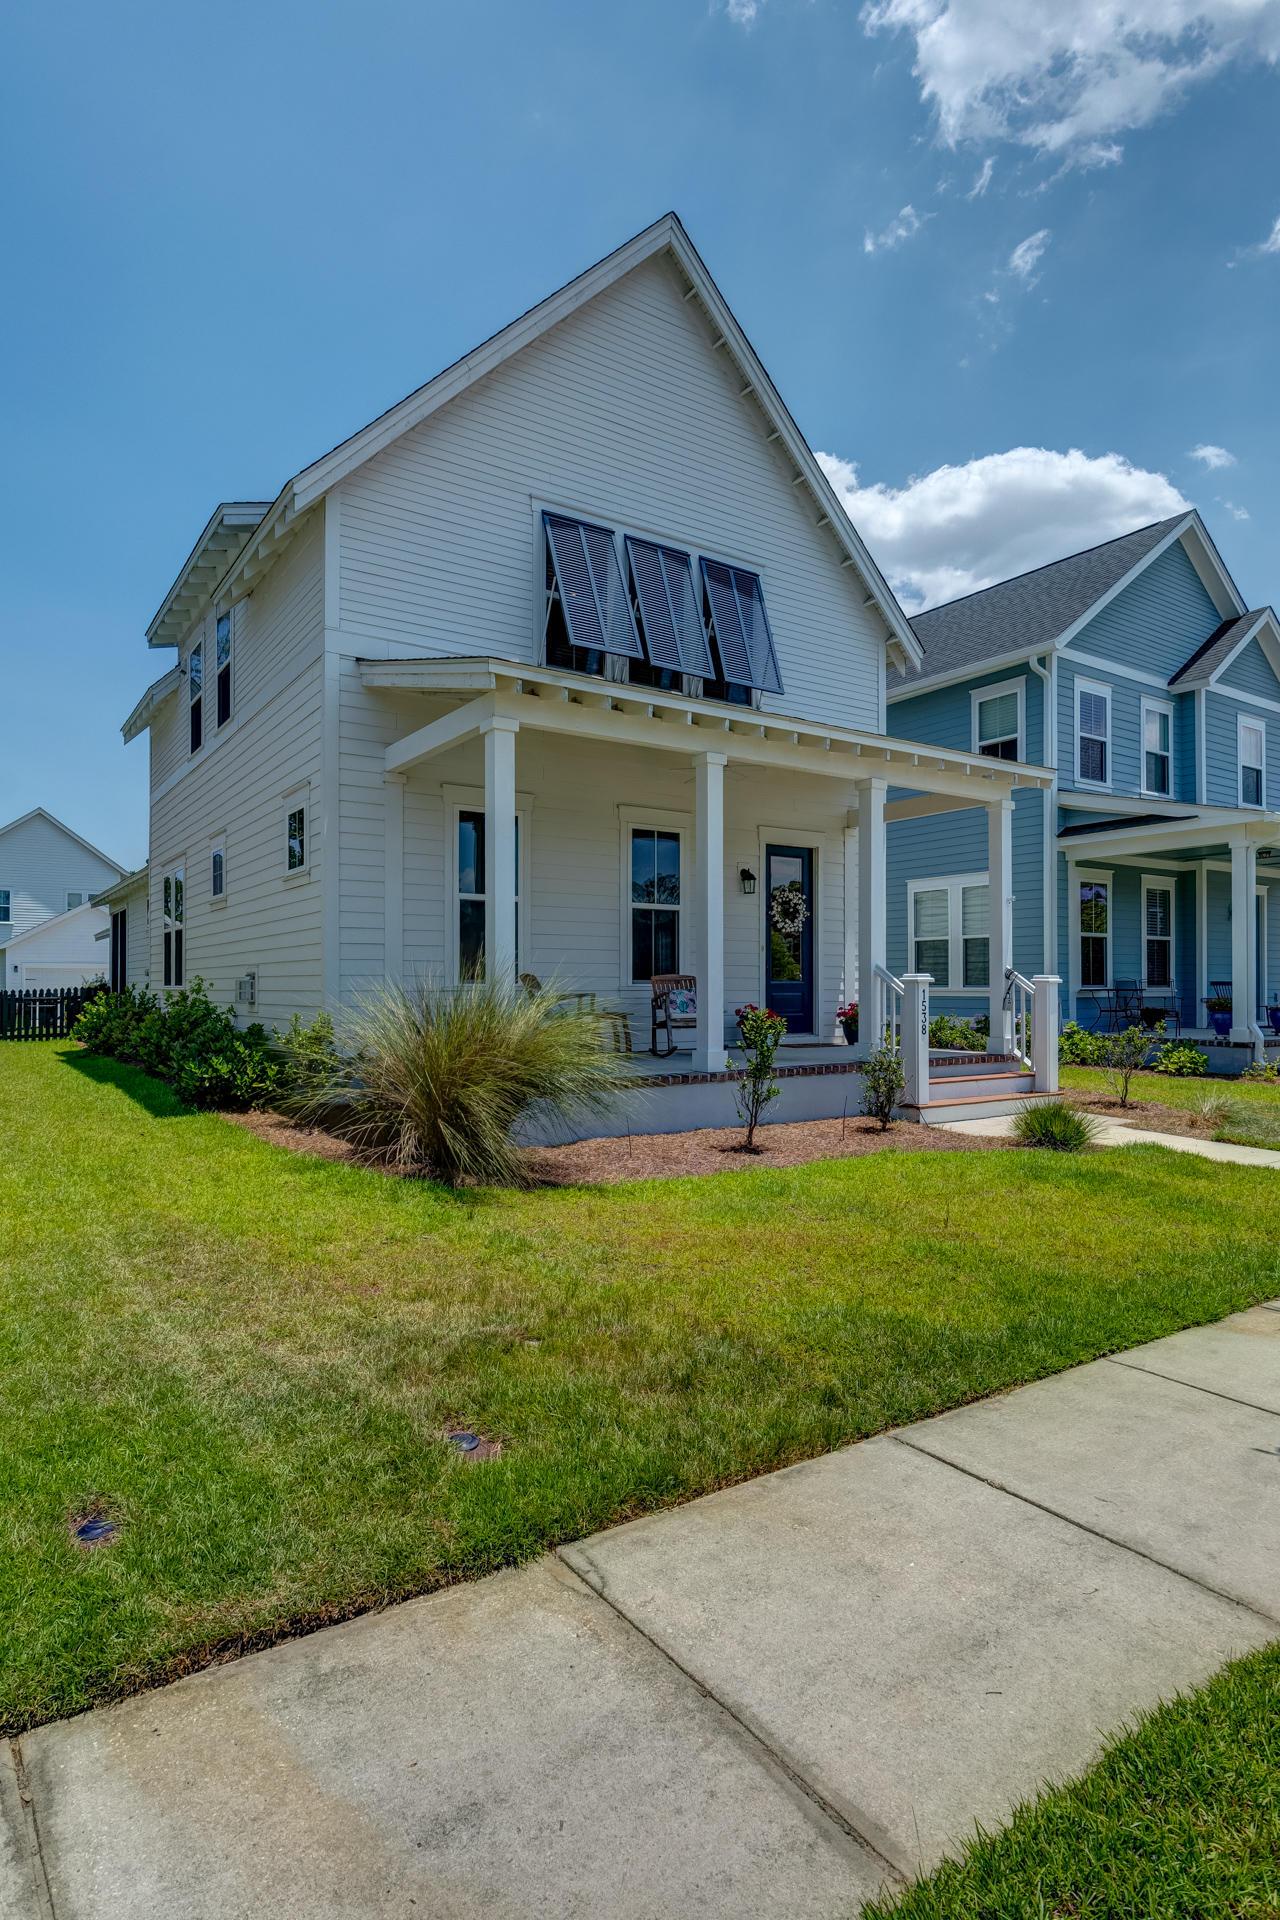 Carolina Park Homes For Sale - 1538 Watt Pond, Mount Pleasant, SC - 38